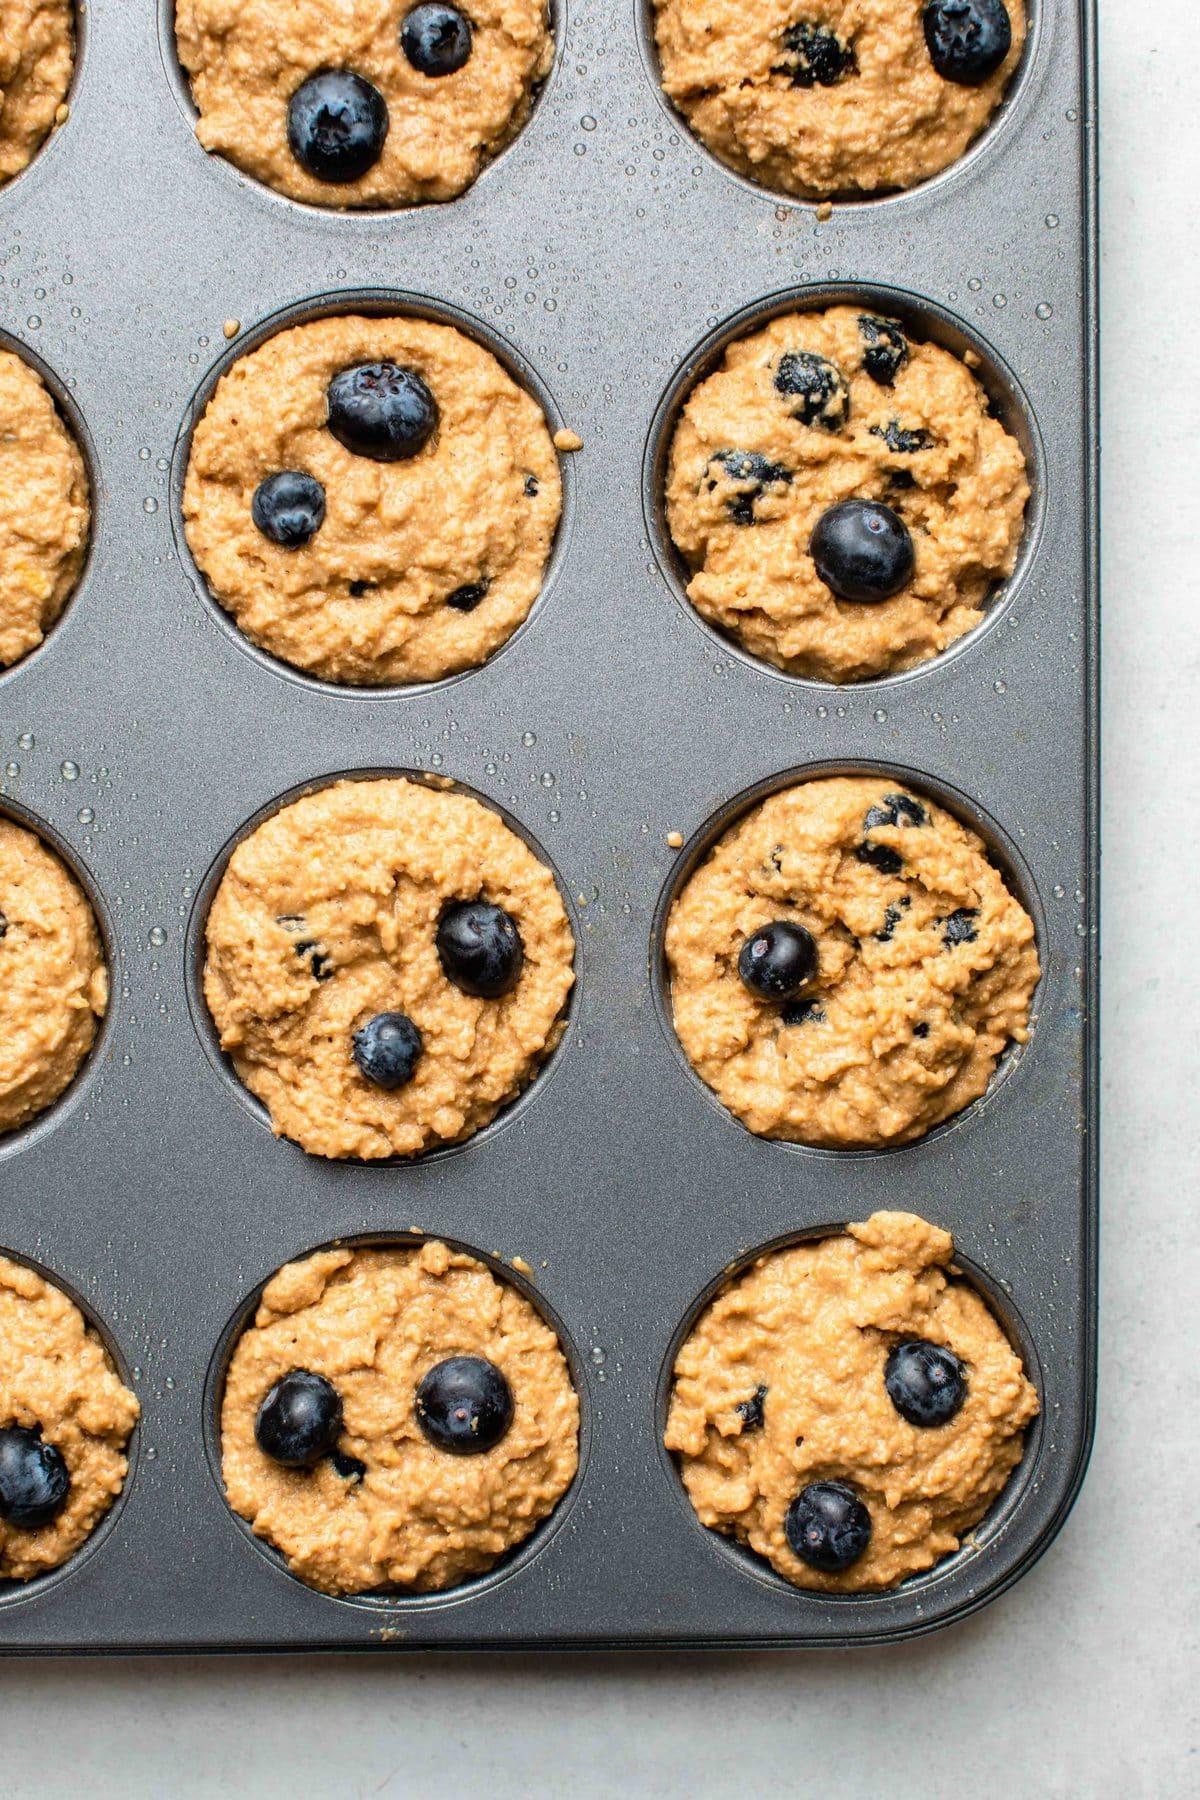 lemon blueberry muffin batter in muffin tin before baking